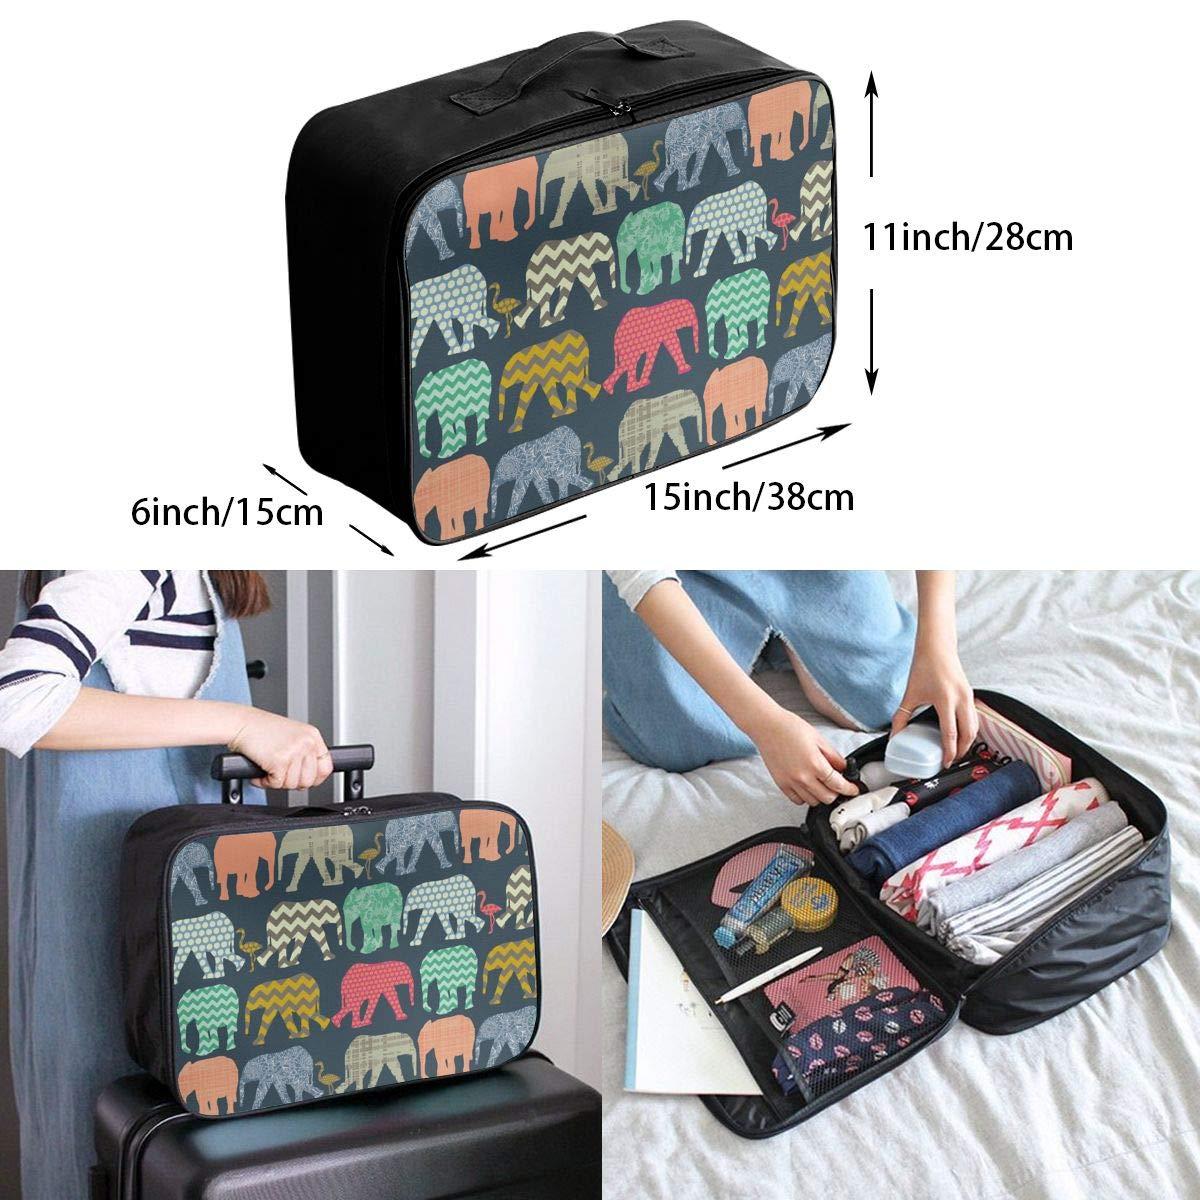 YueLJB Elephant Flamingo Art Print Lightweight Large Capacity Portable Luggage Bag Travel Duffel Bag Storage Carry Luggage Duffle Tote Bag